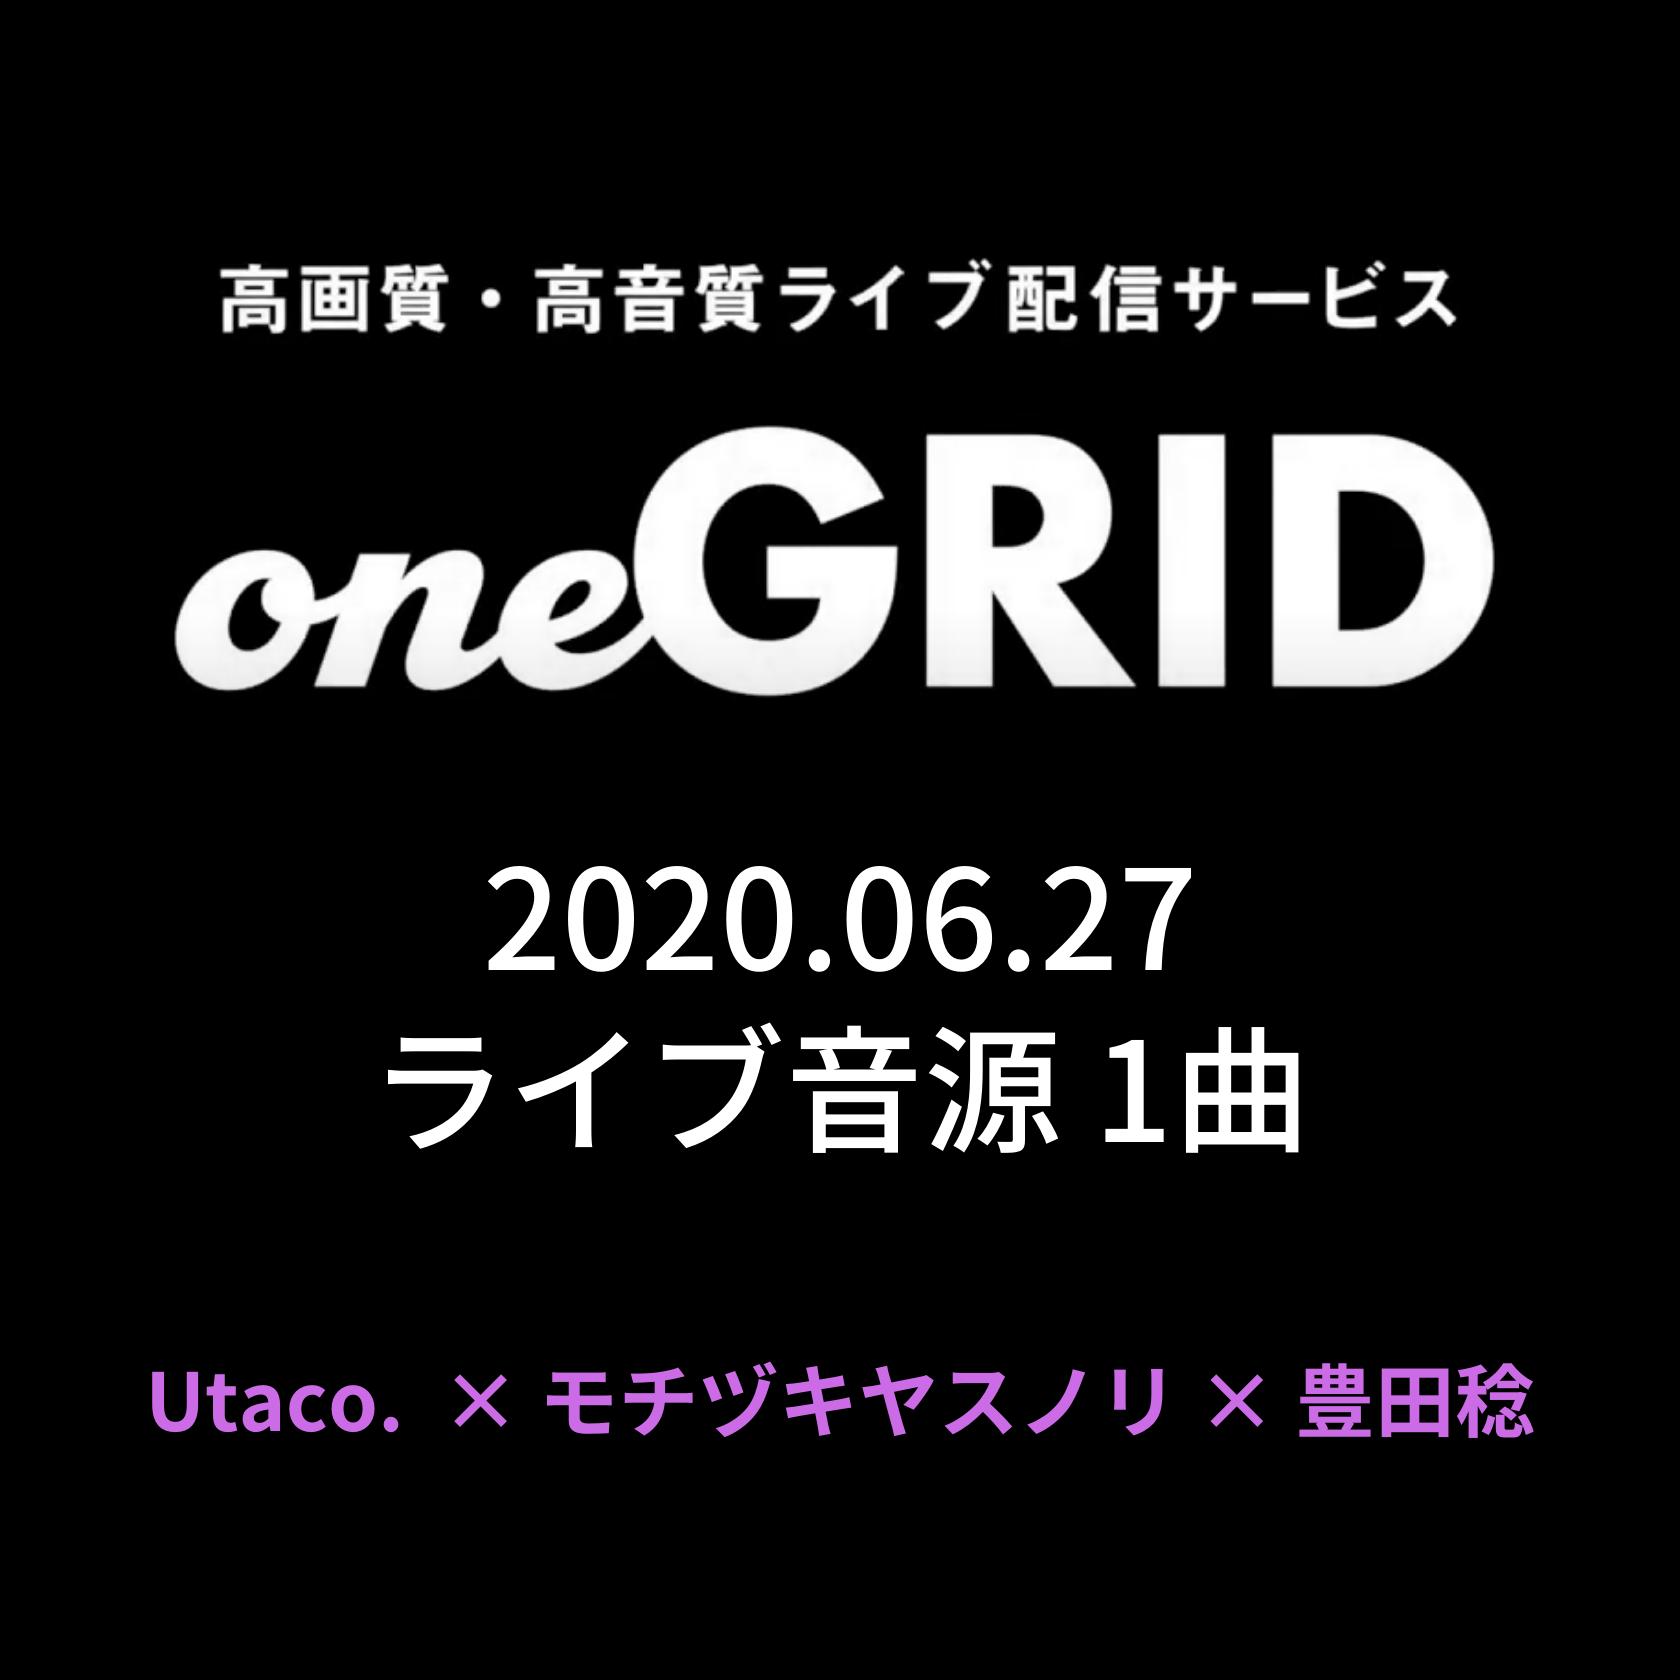 6/27 Utaco. × モチヅキヤスノリ × 豊田稔 Live音源 1曲